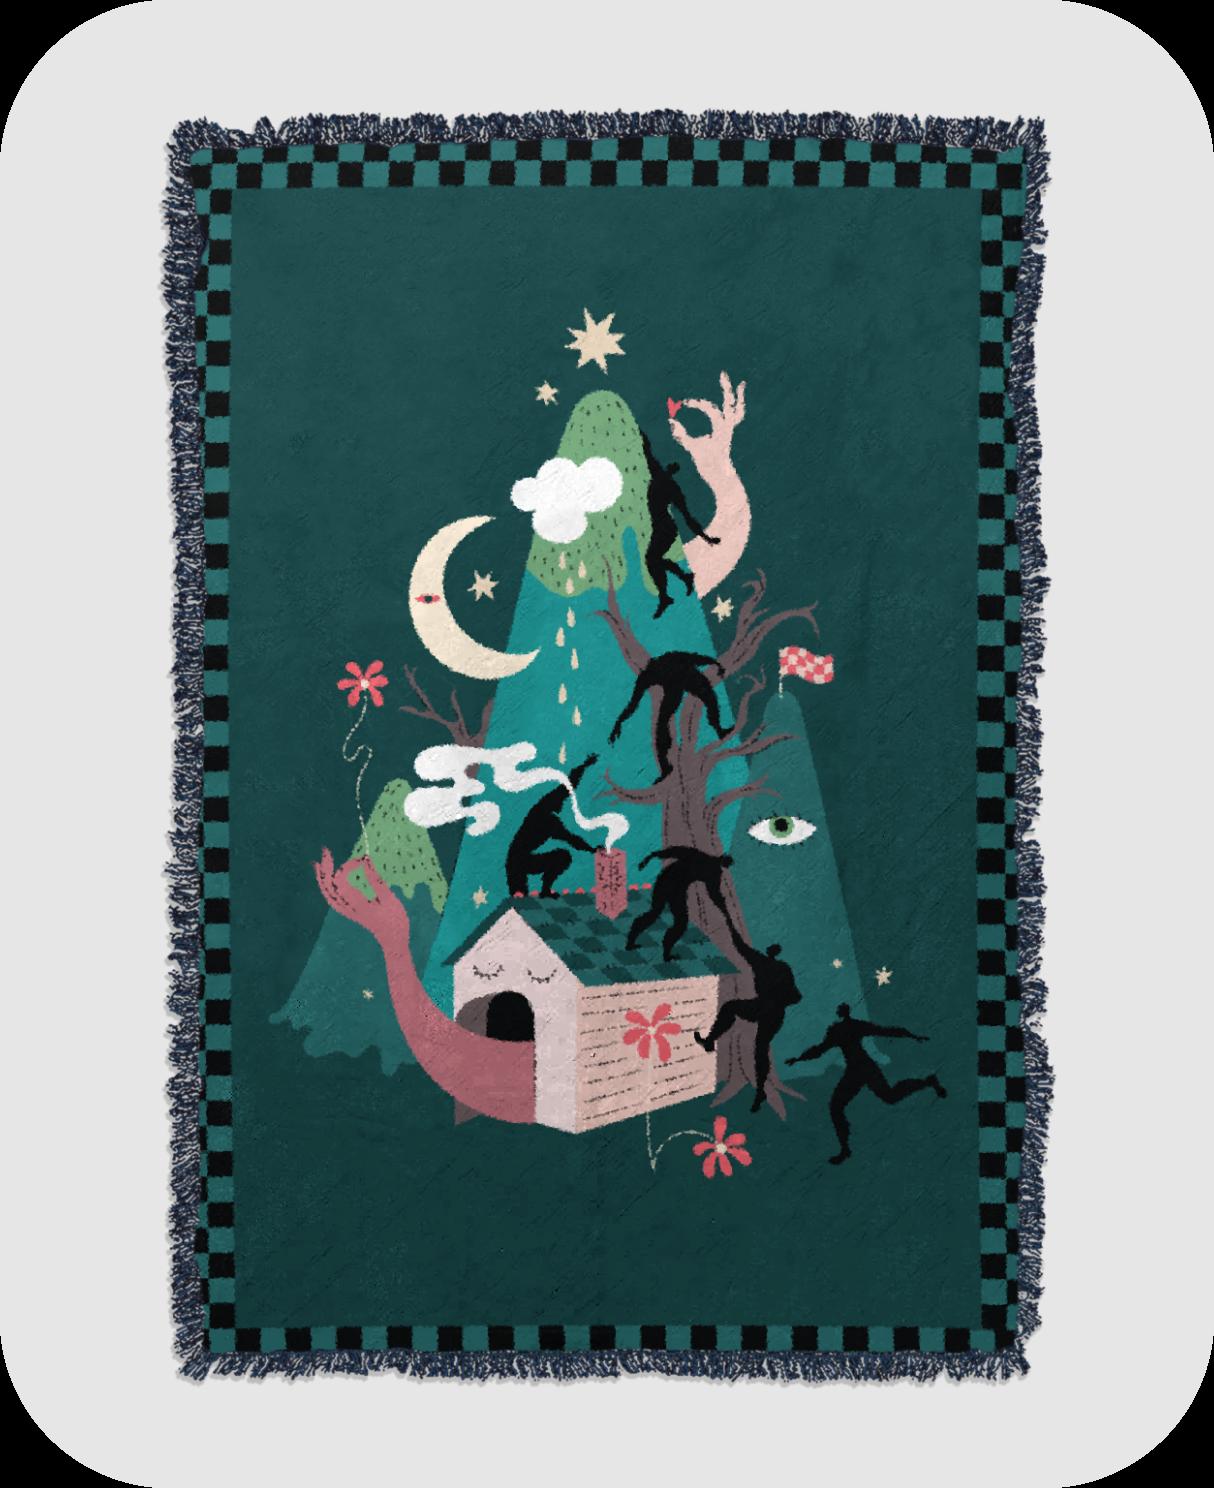 Oscar Tapestry